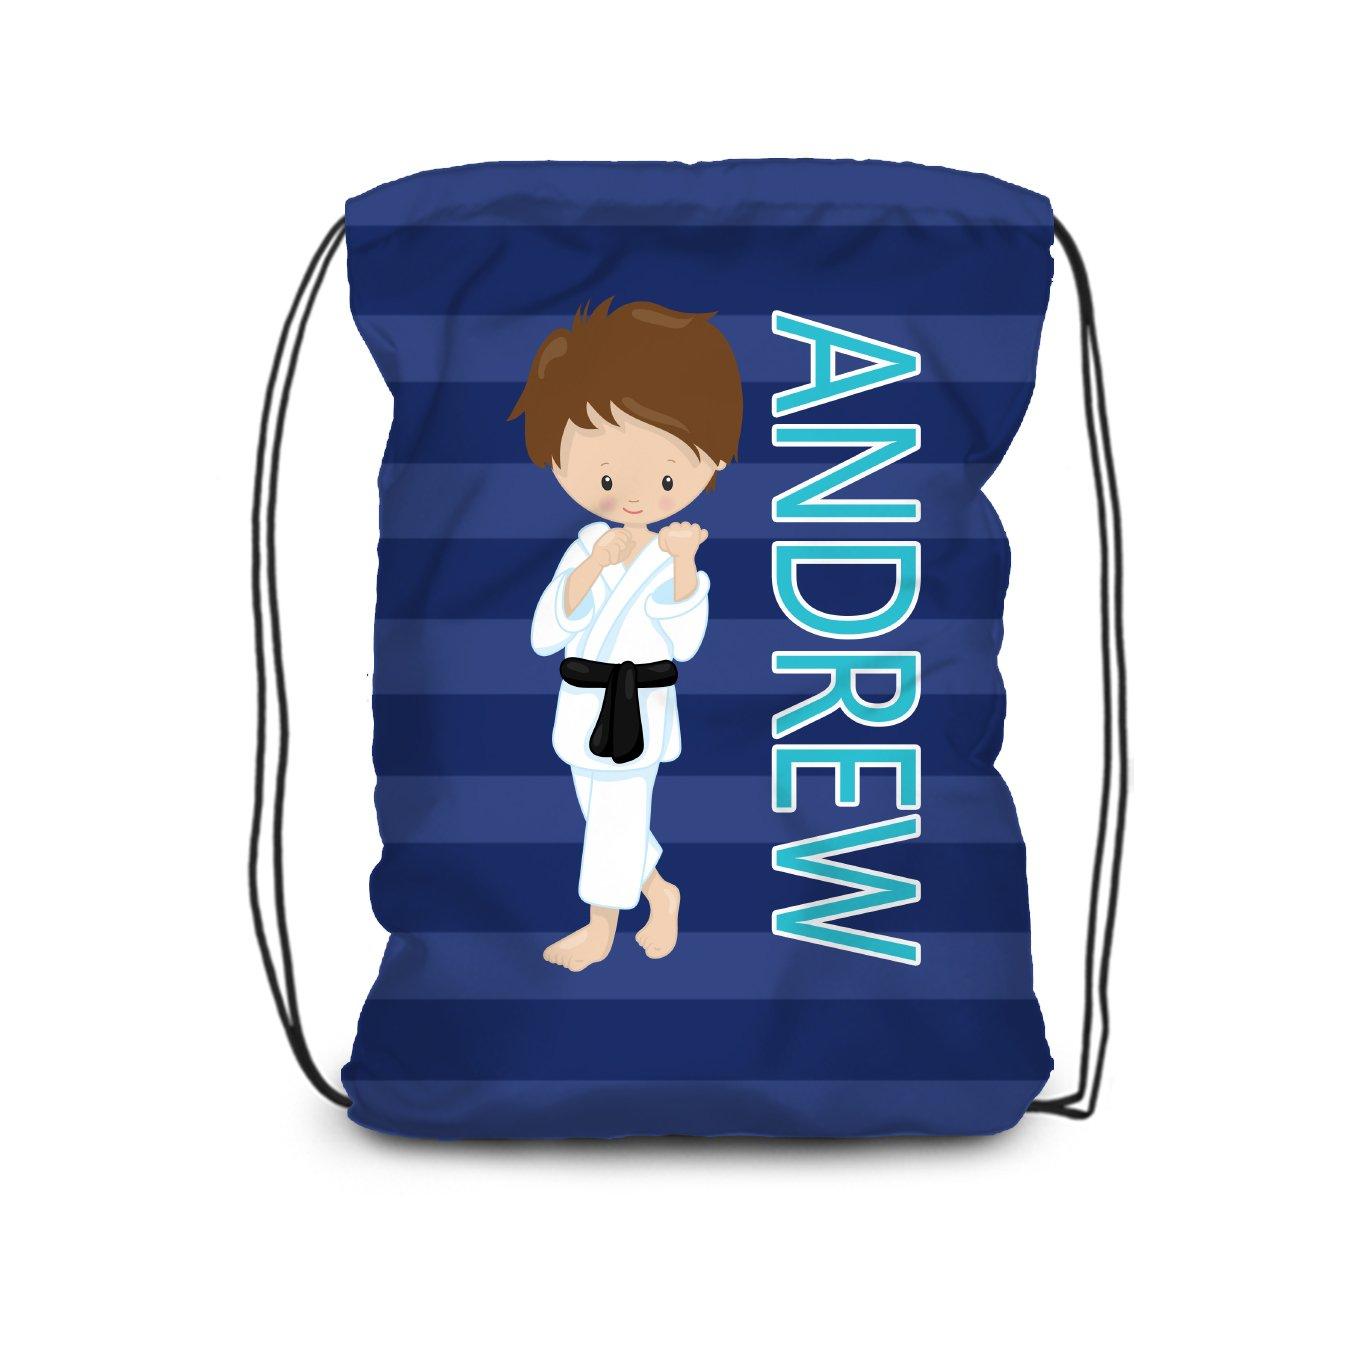 Karate Drawstring Backpack - Black Karate Boy Personalized Name Bag